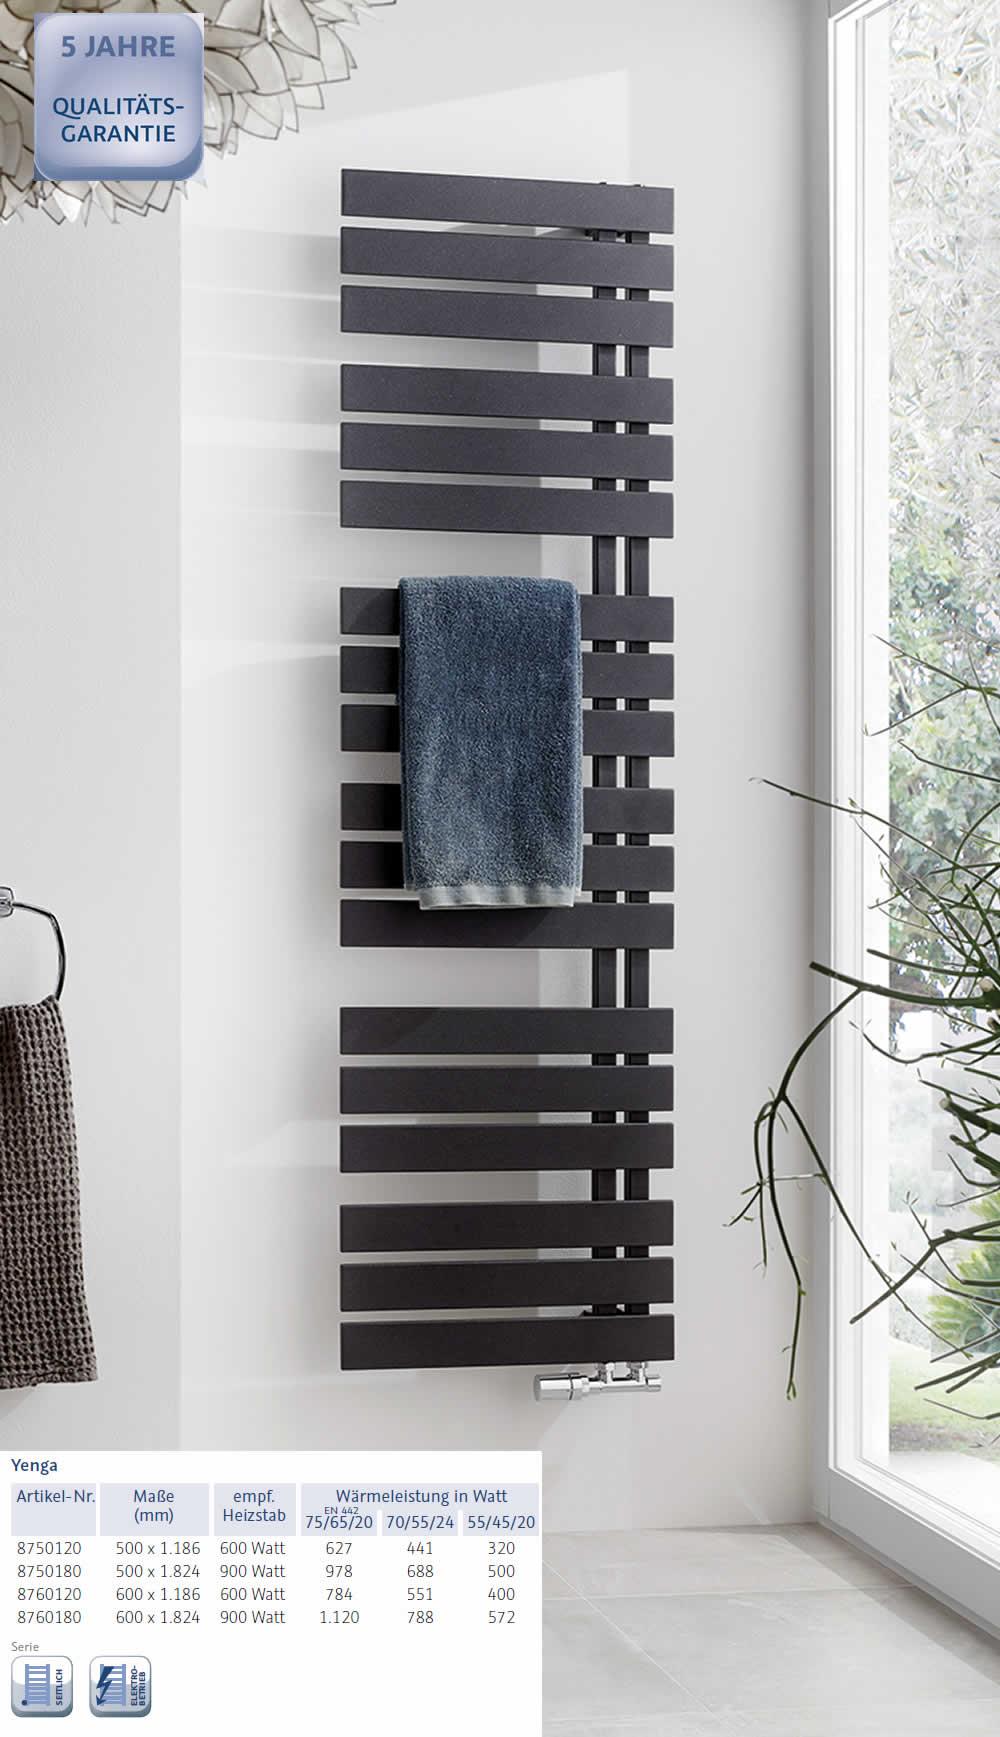 HSK YENGA Heizkörper - 600 x 1824 mm - graphit-schwarz   Impulsbad